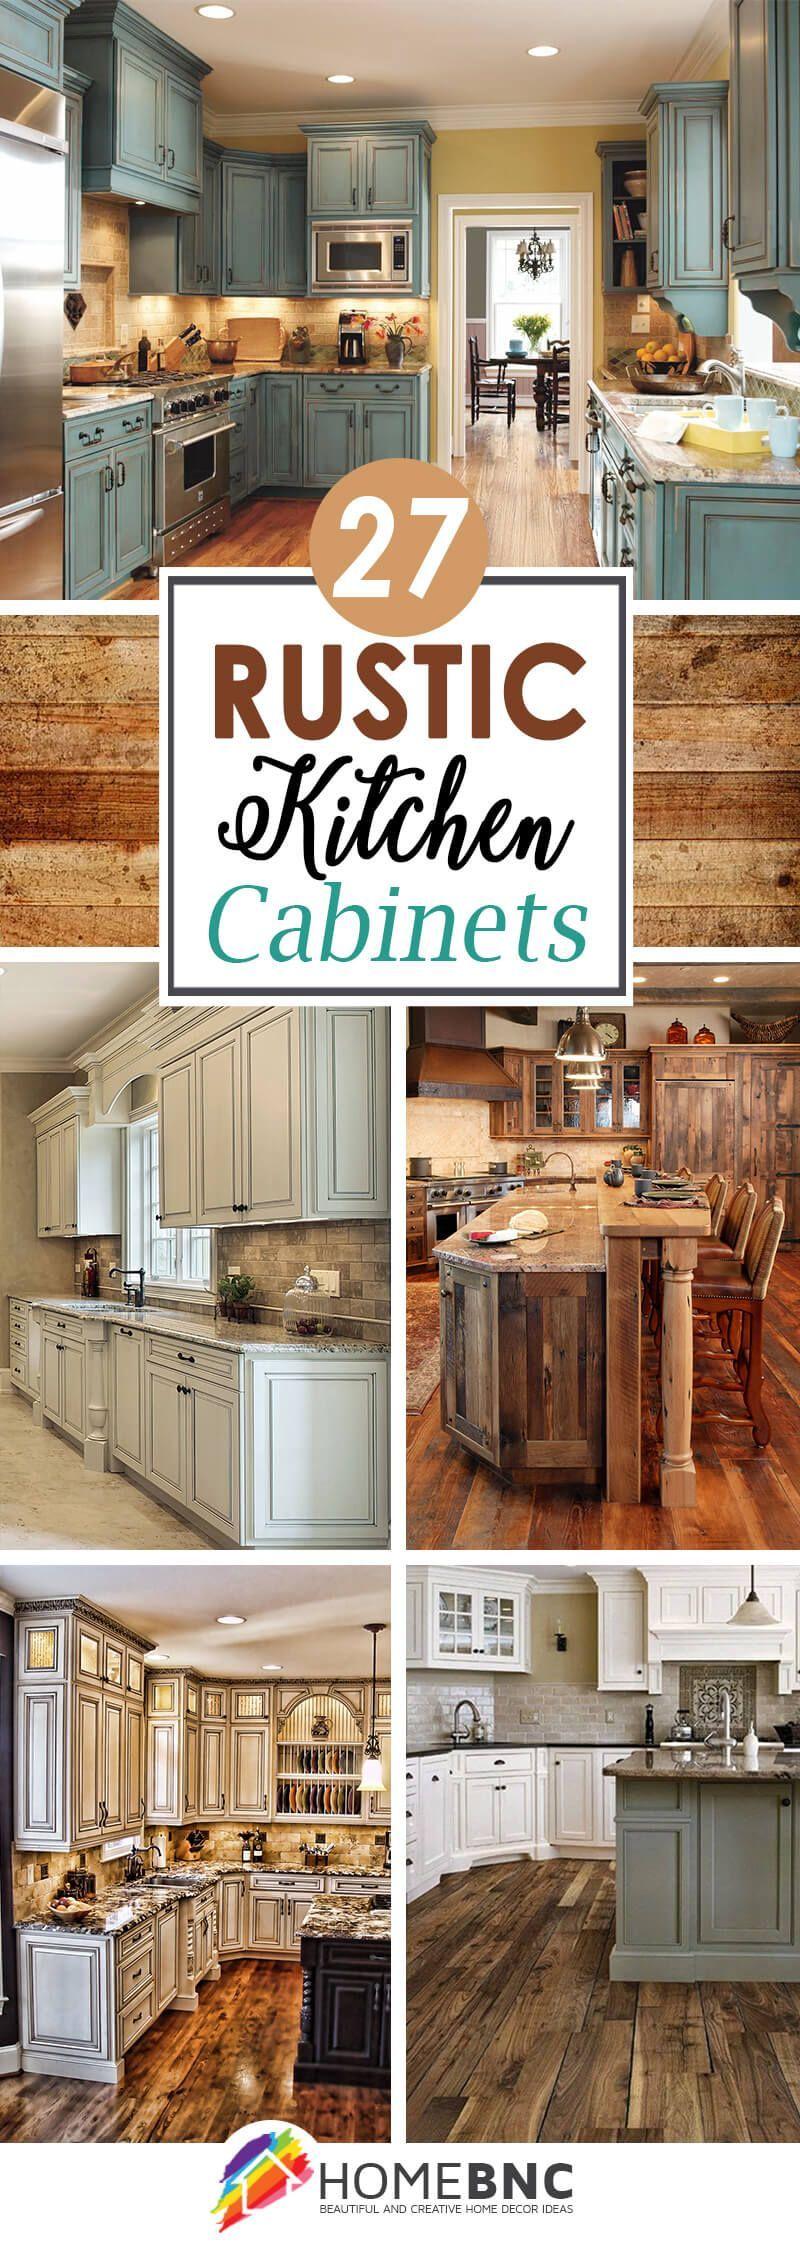 Rustic Kitchen Cabinet Ideas | Kitchen Remodeling | Pinterest ...